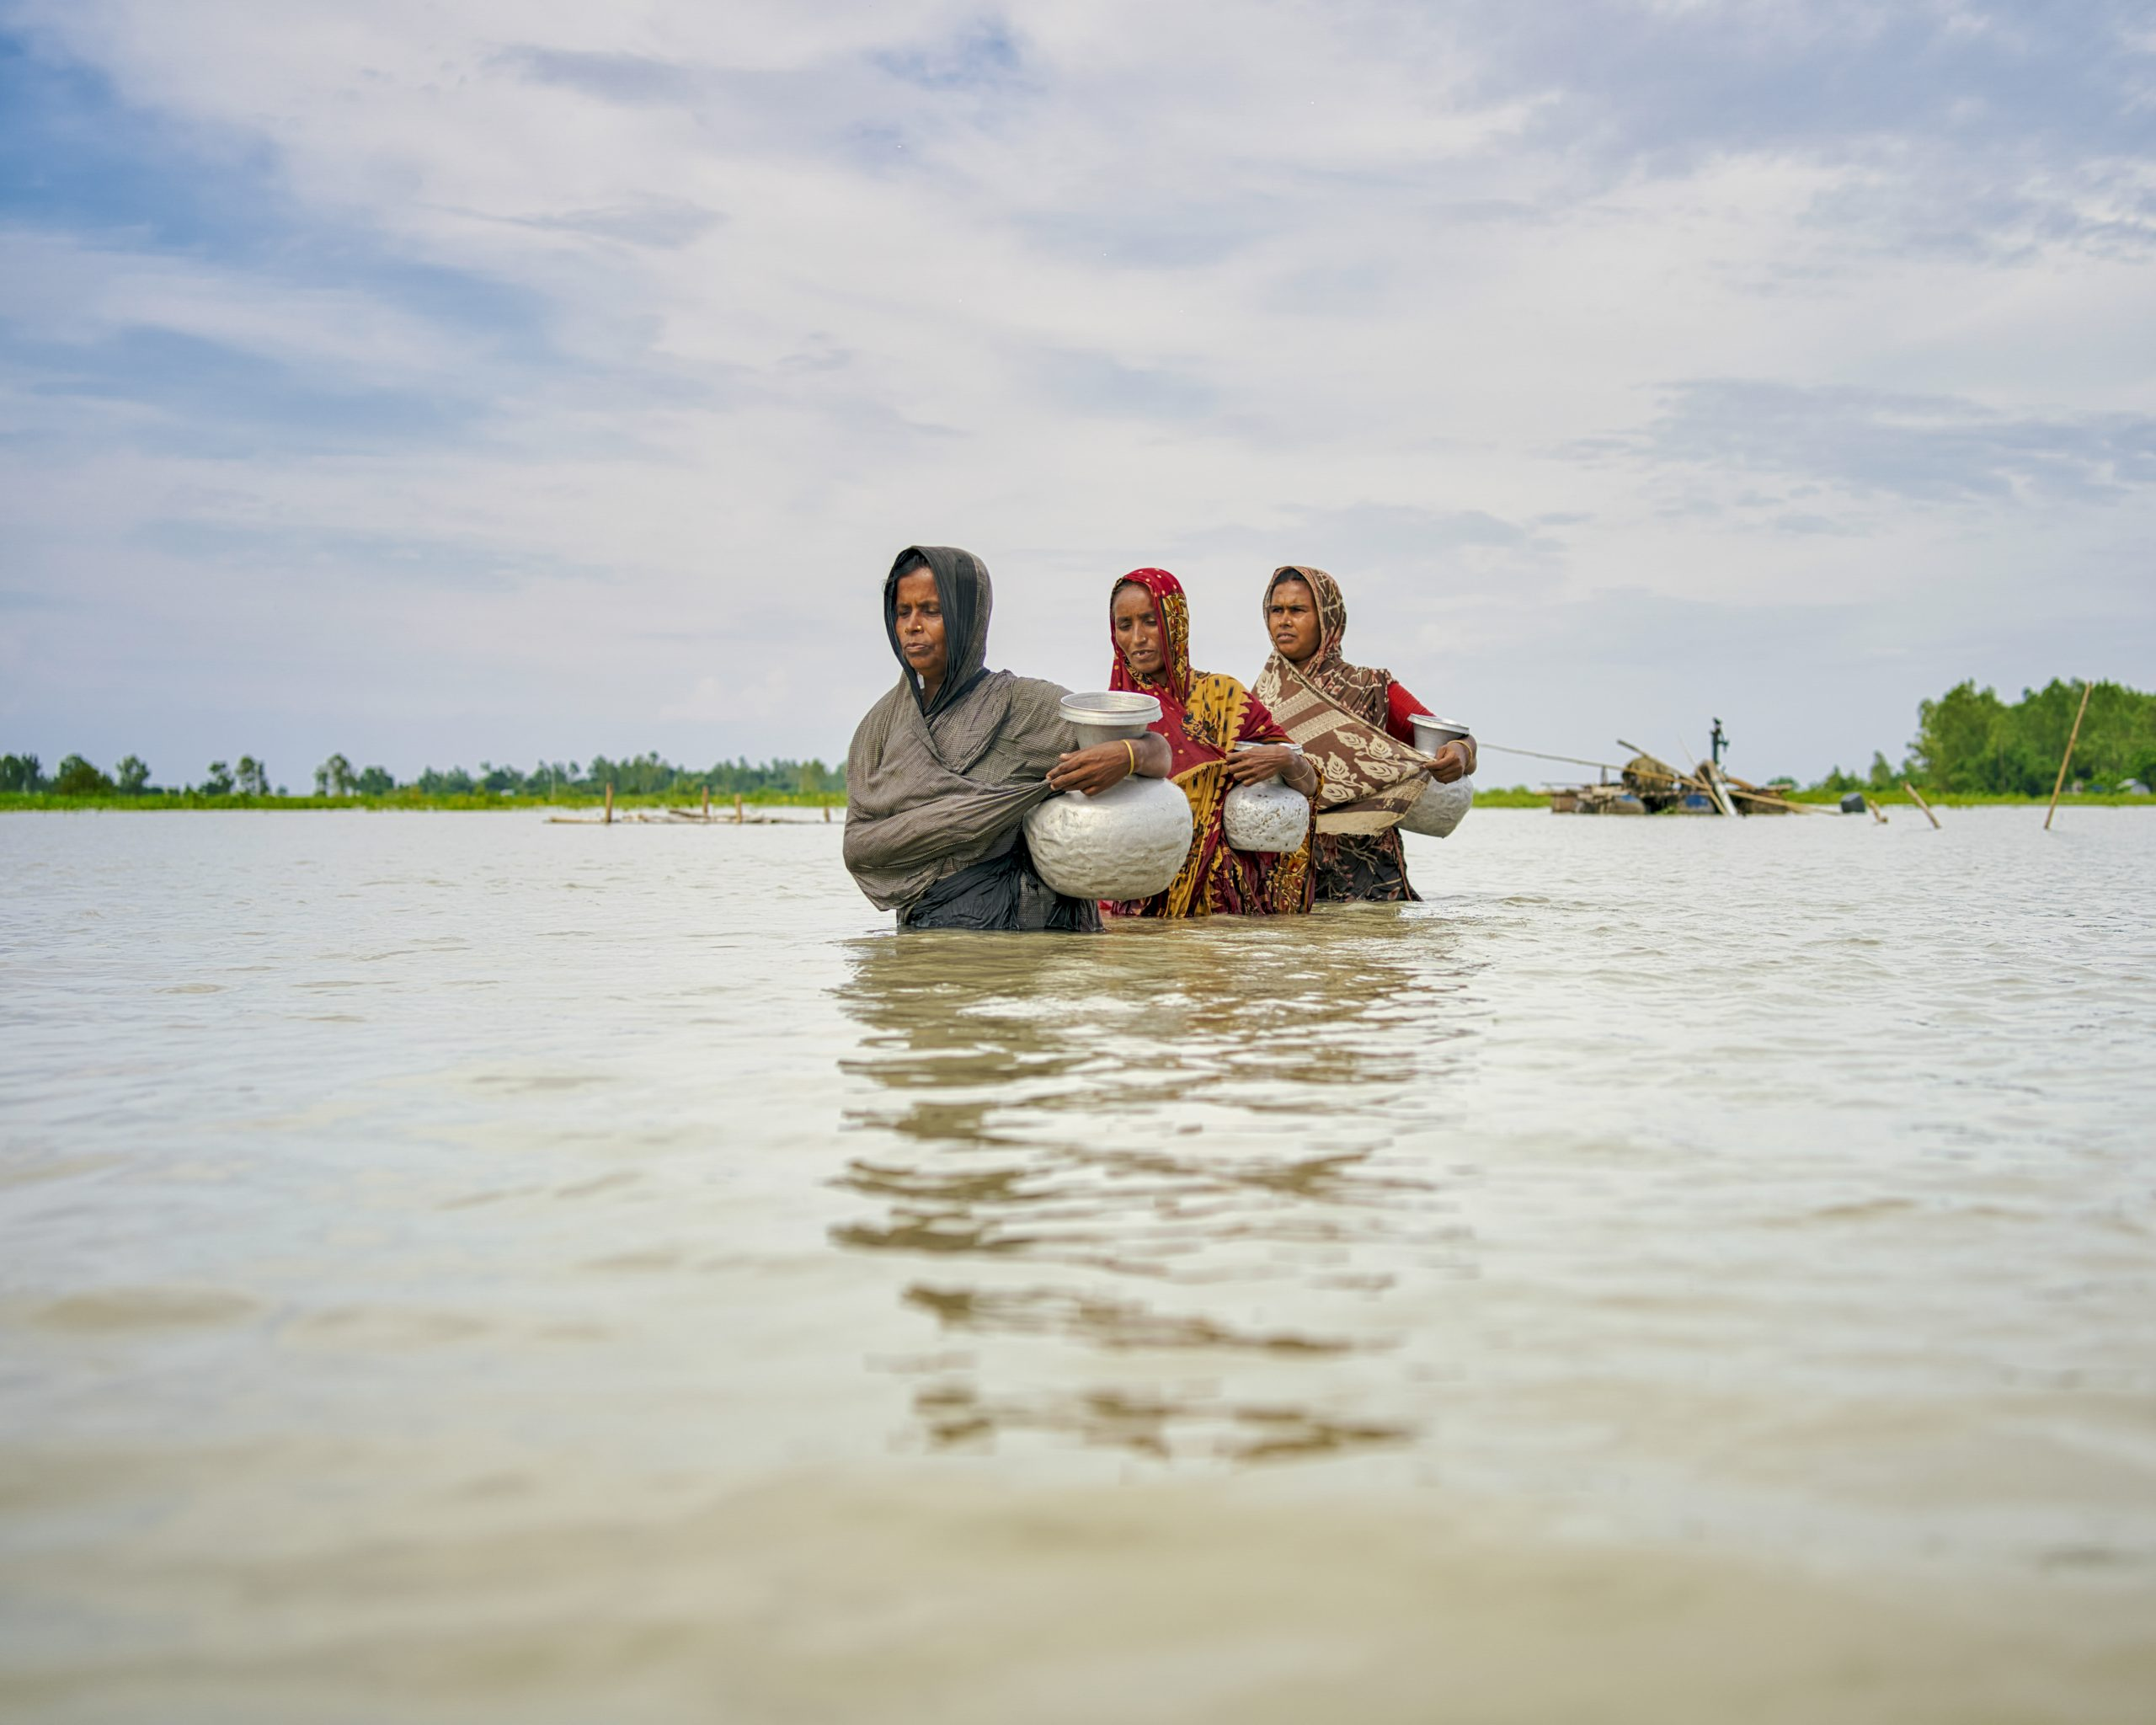 women wade through water carrying bowls of food